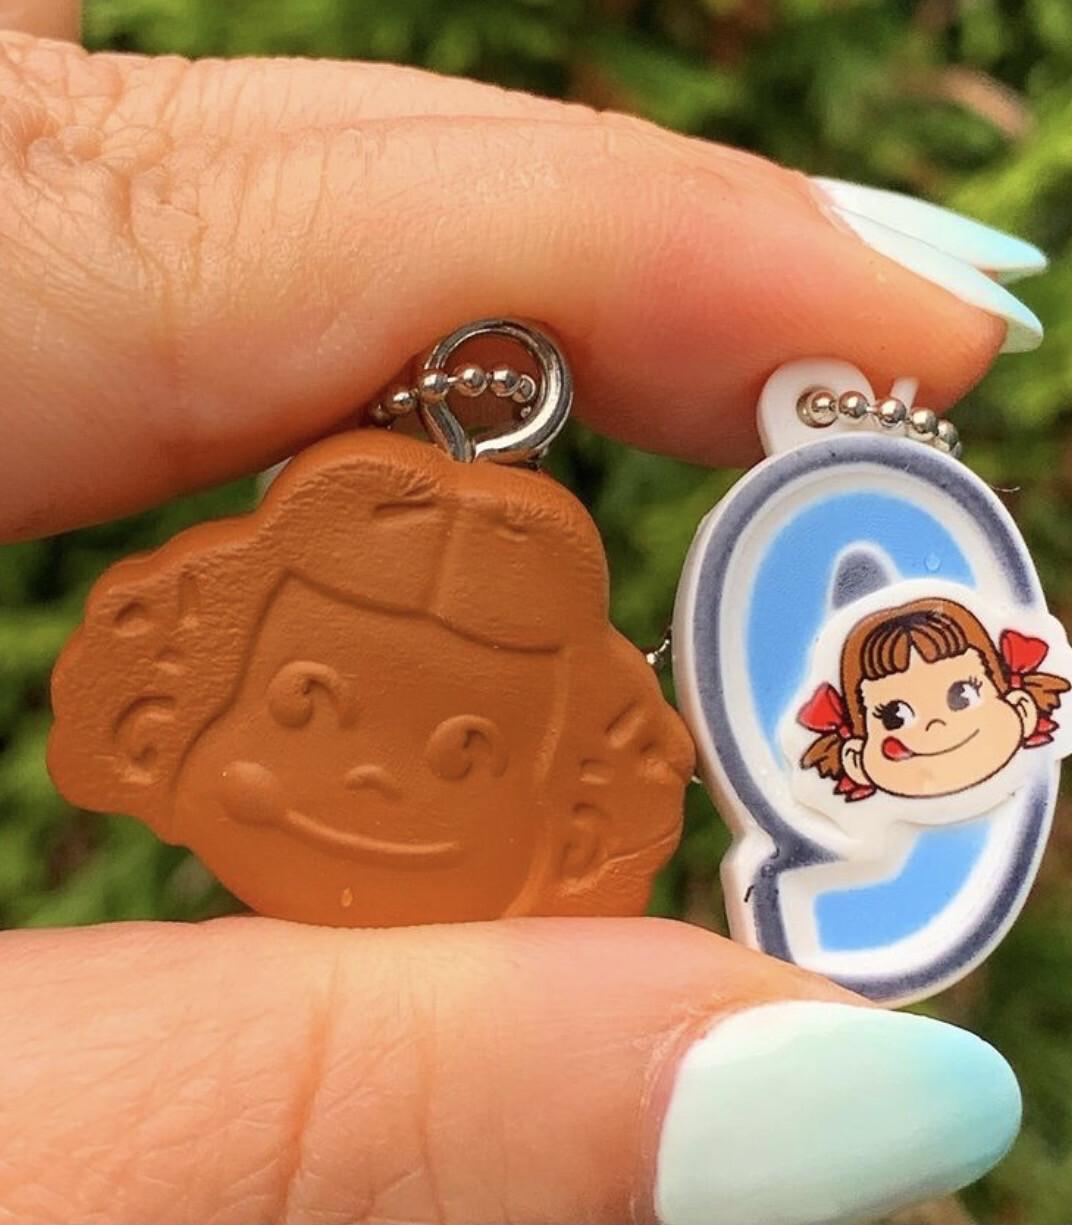 Bandai Peko Chan Cream Biscuit Keychain